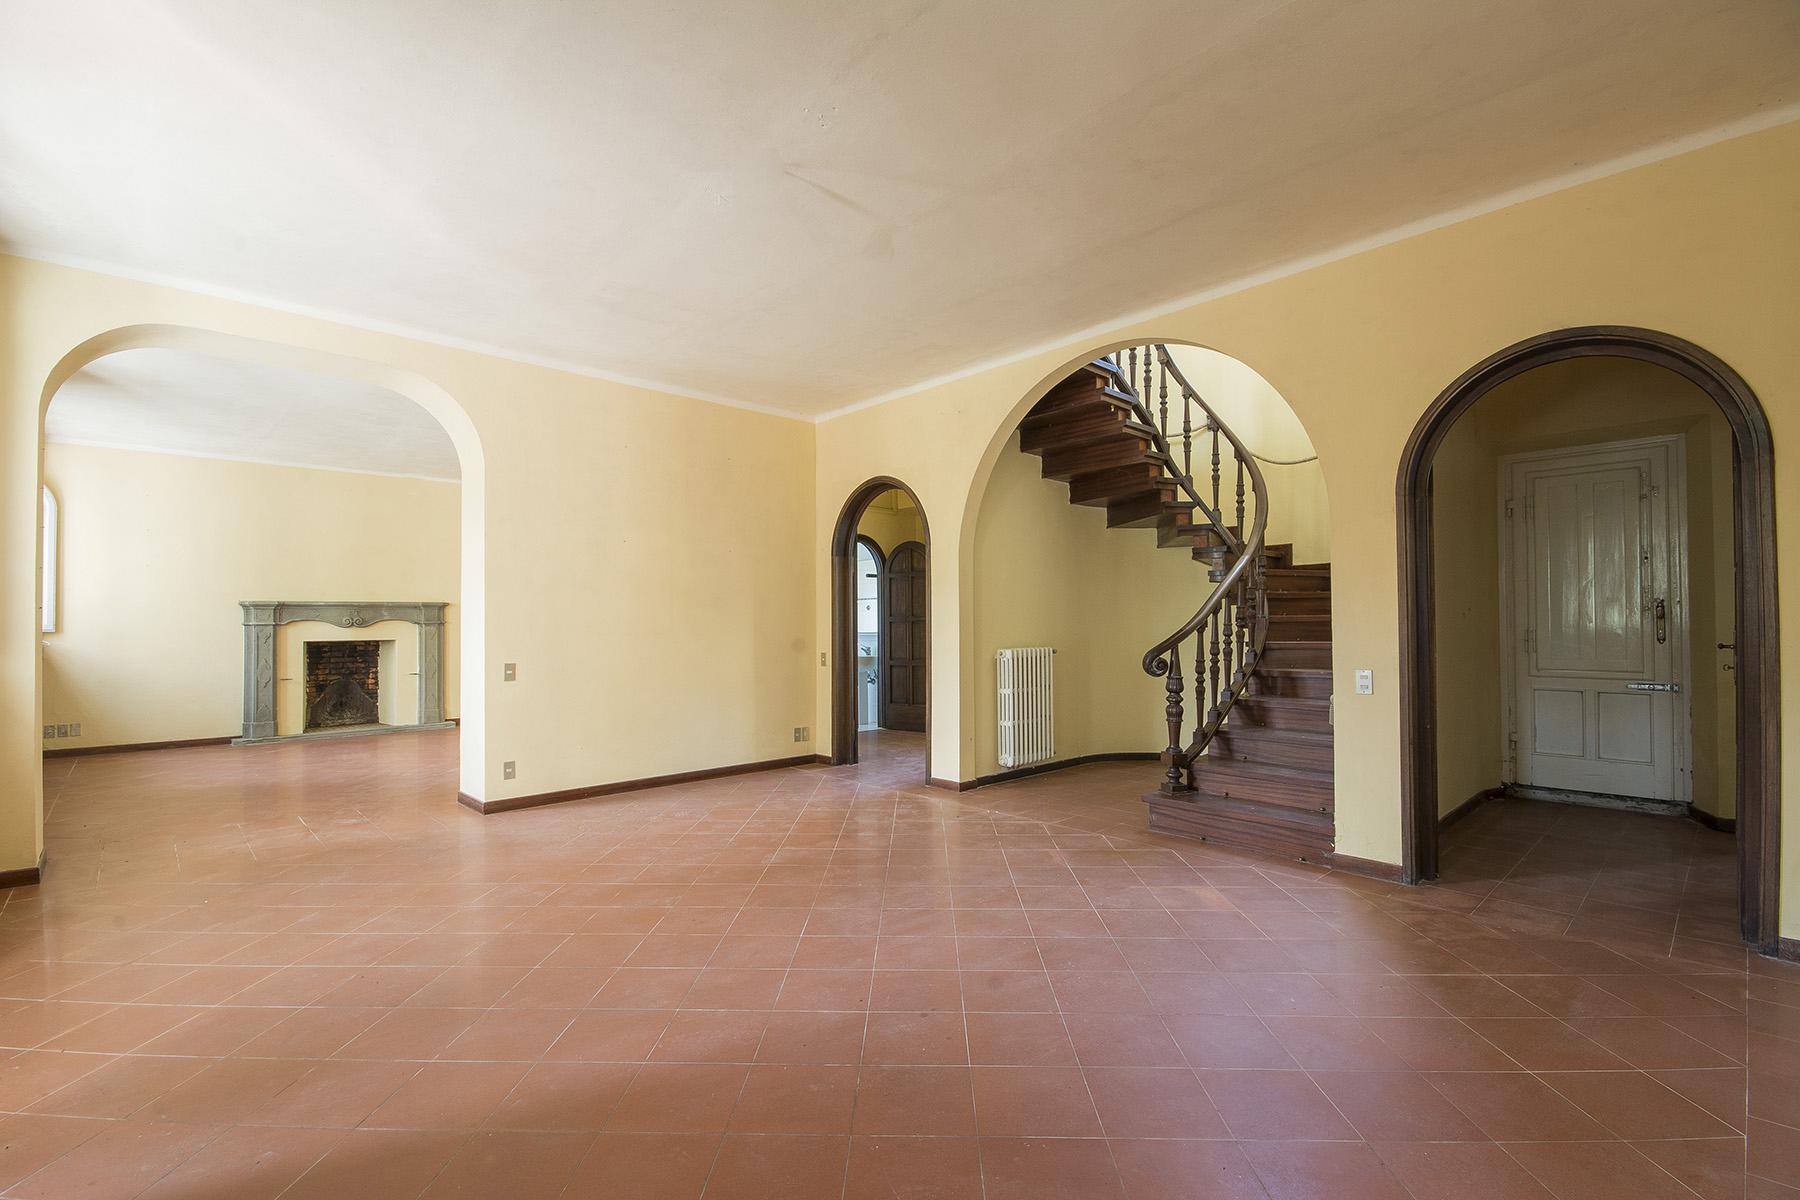 Villa in Vendita a Lucca: 5 locali, 700 mq - Foto 6